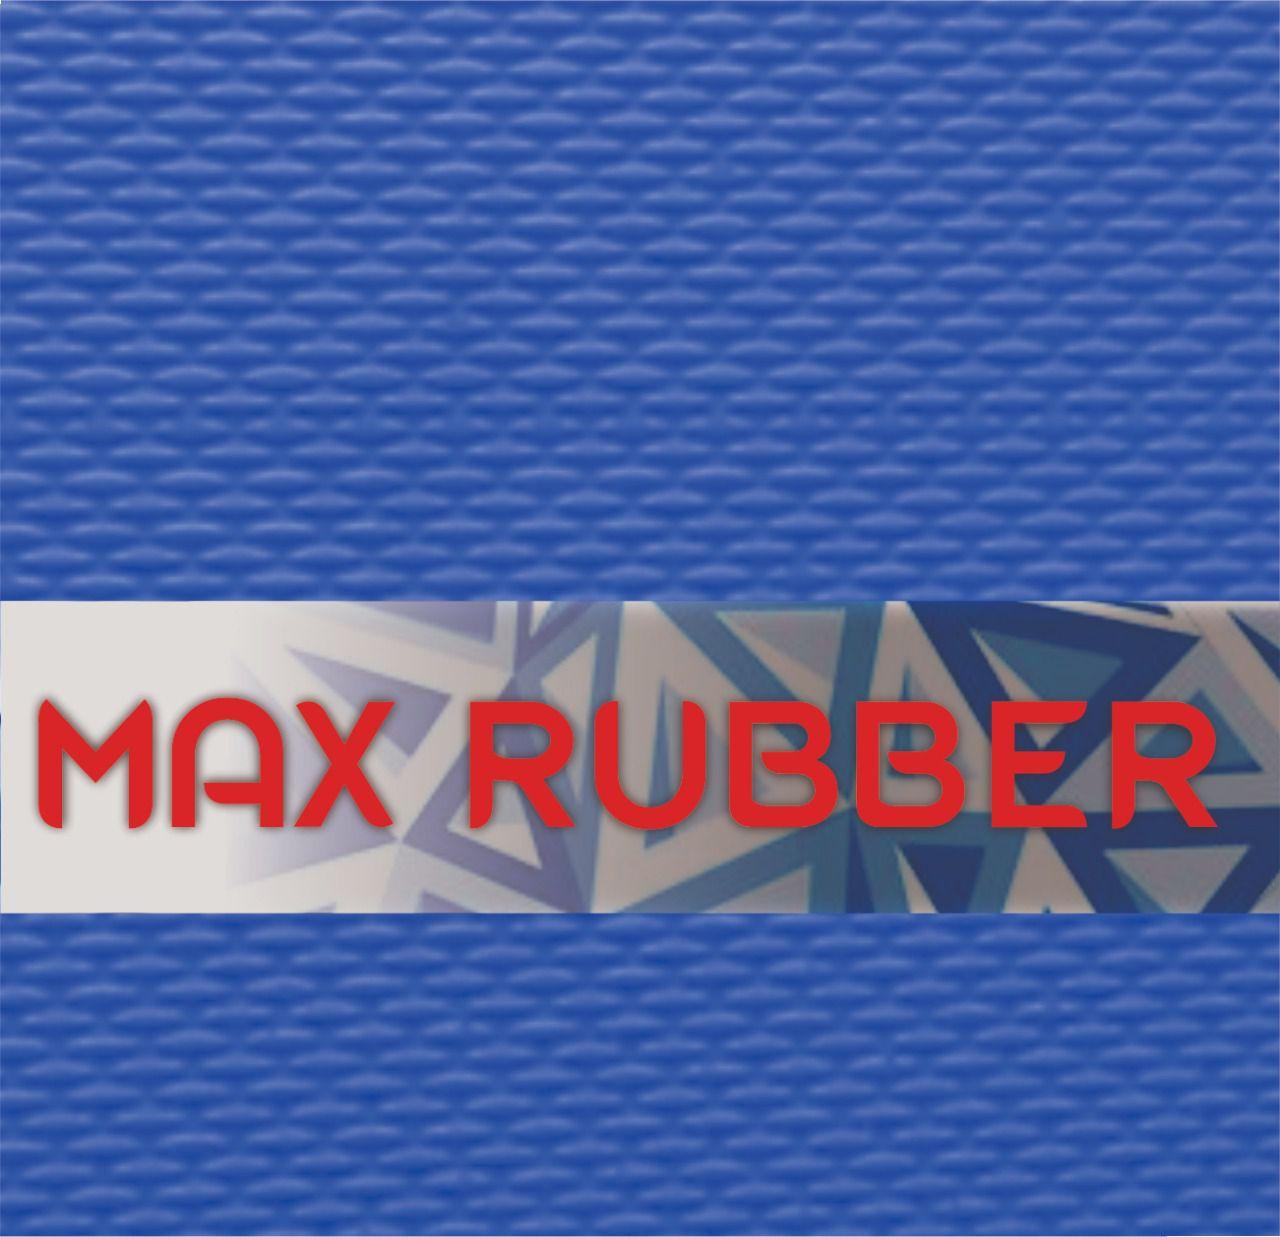 Placa Microporosa MAX RUBBER - 1,50m x 0,90m x 15mm - UNIDADE  - INBOP - Indústria de Borrachas e Polímeros